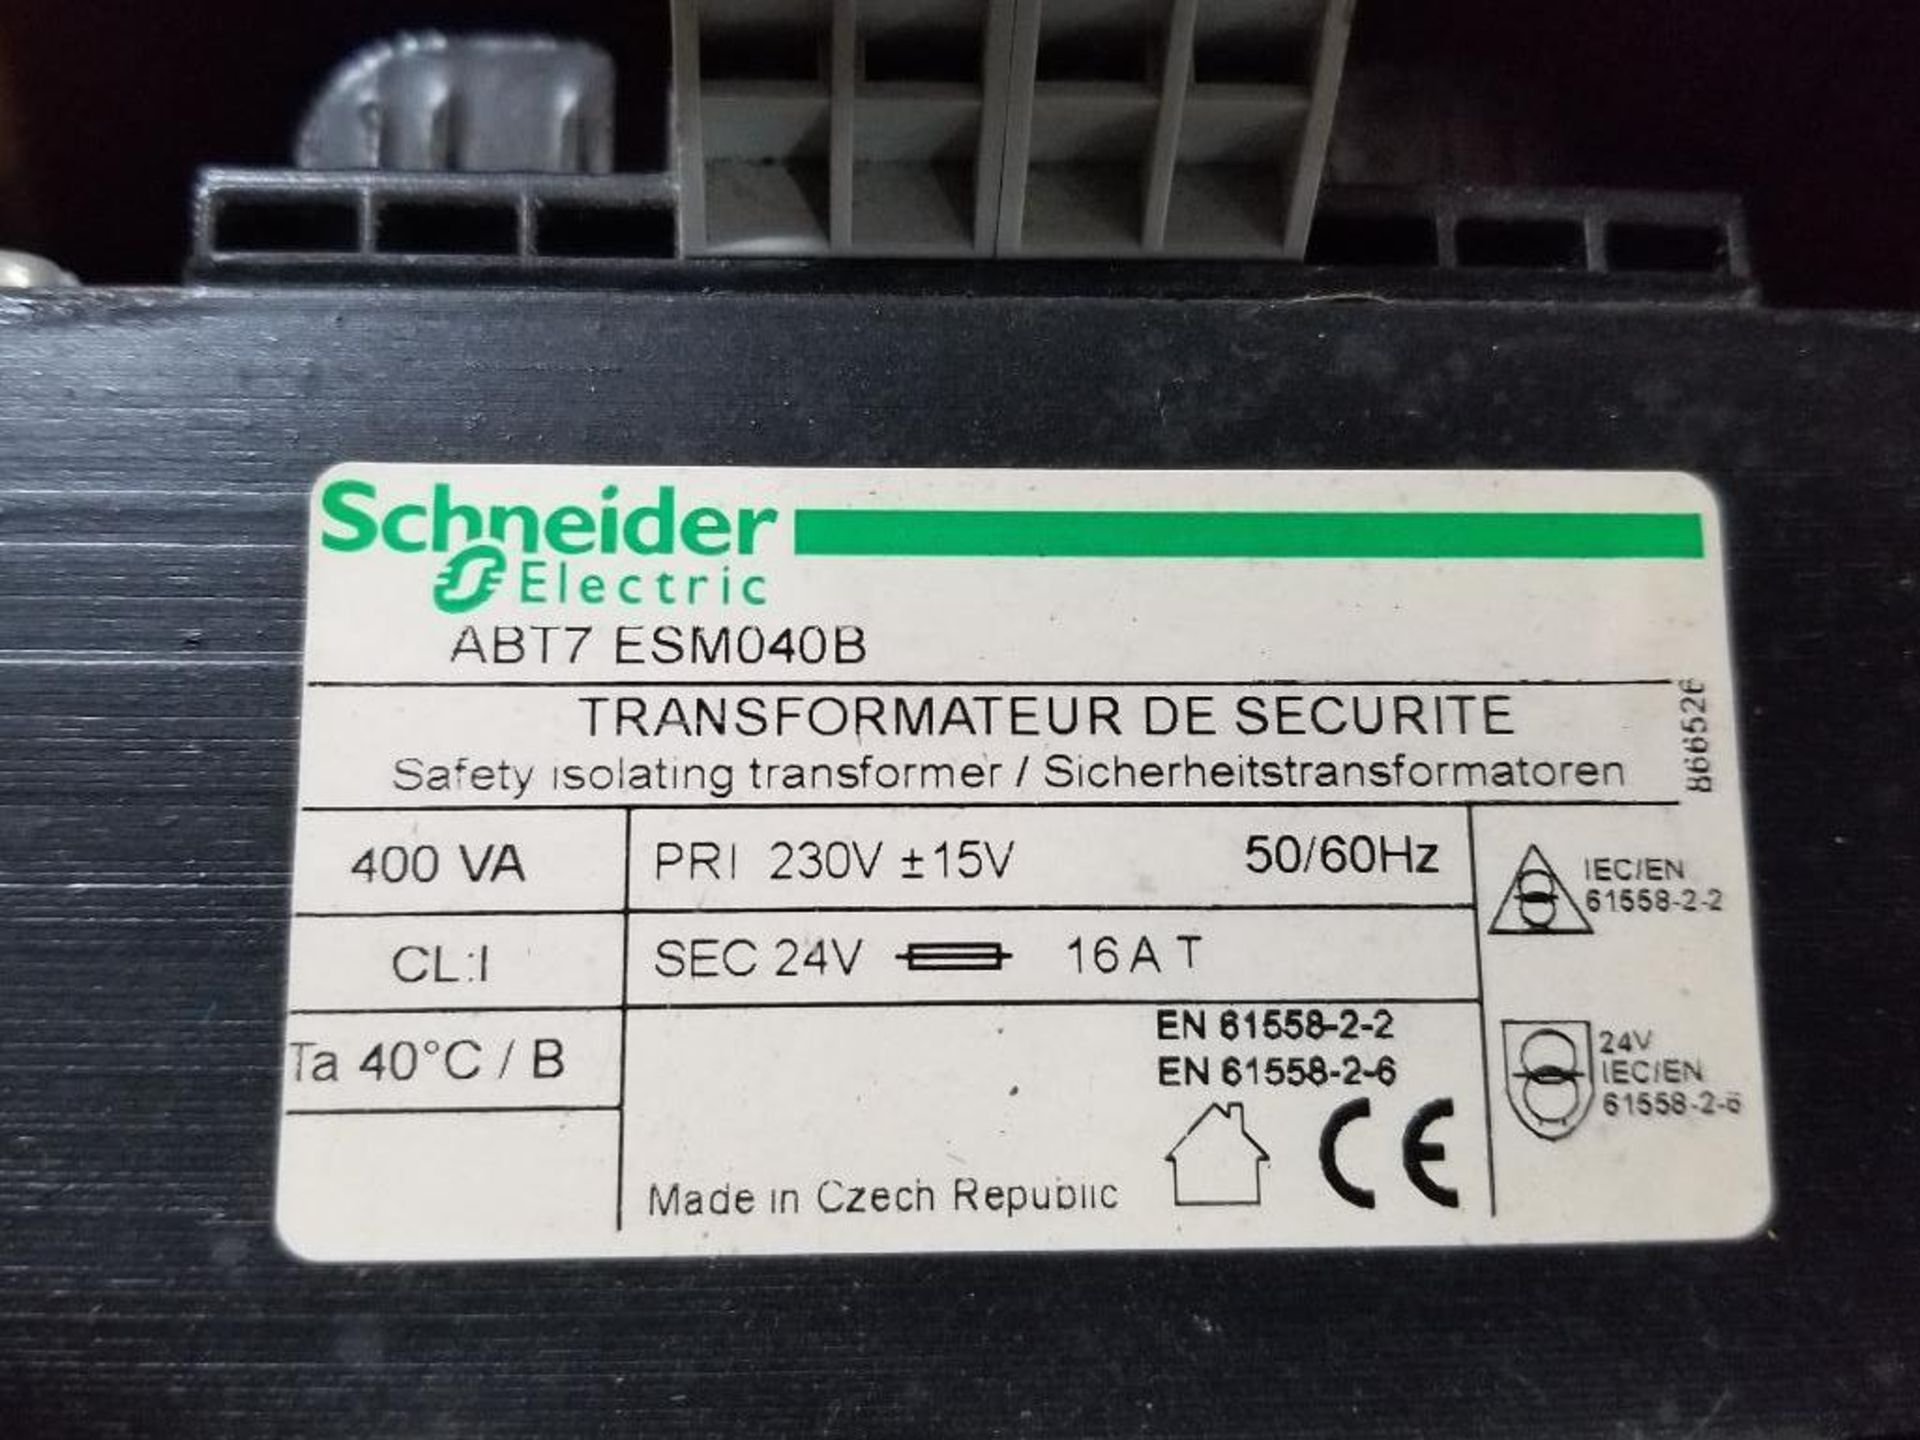 Qty 2 - Industrial transformer. Schneider ABT7-ESM040B, EGS E105. - Image 2 of 3